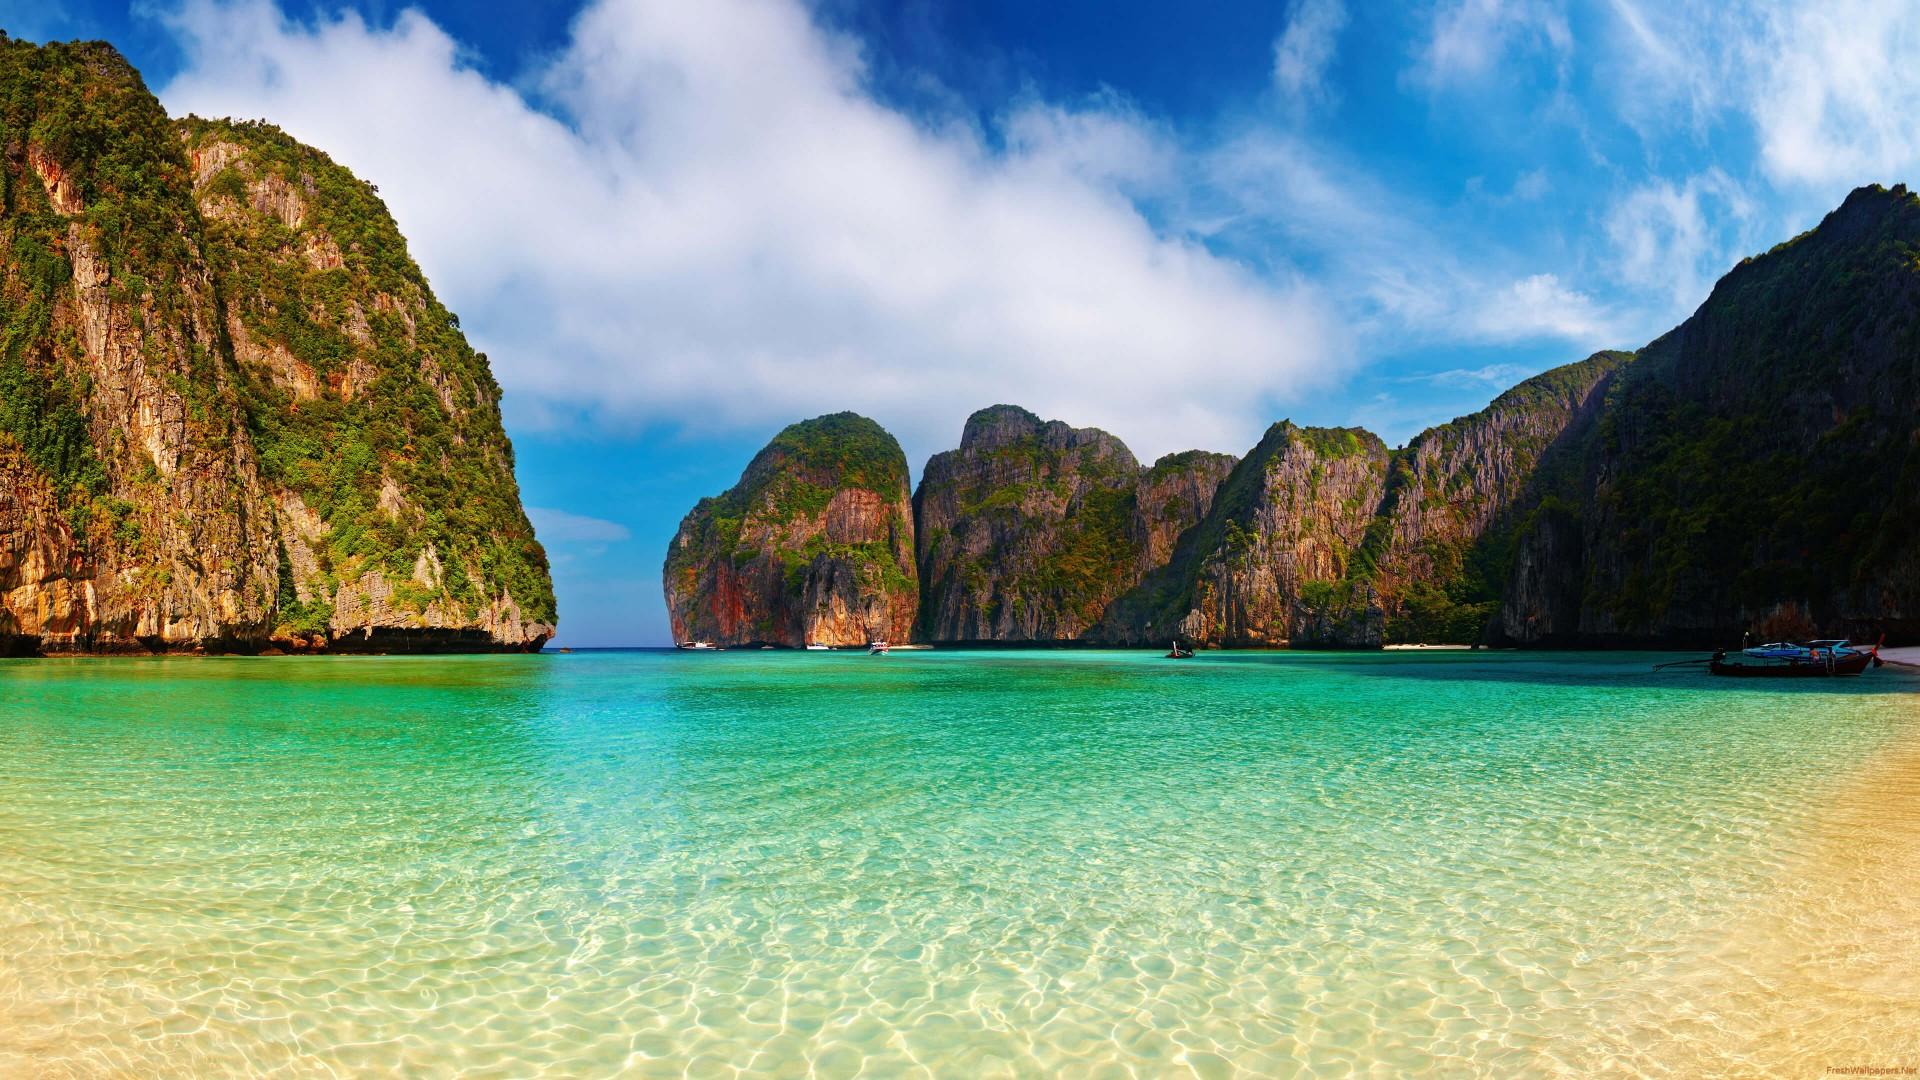 maya-bay-beach-ko-phi-phi-lee-thailand